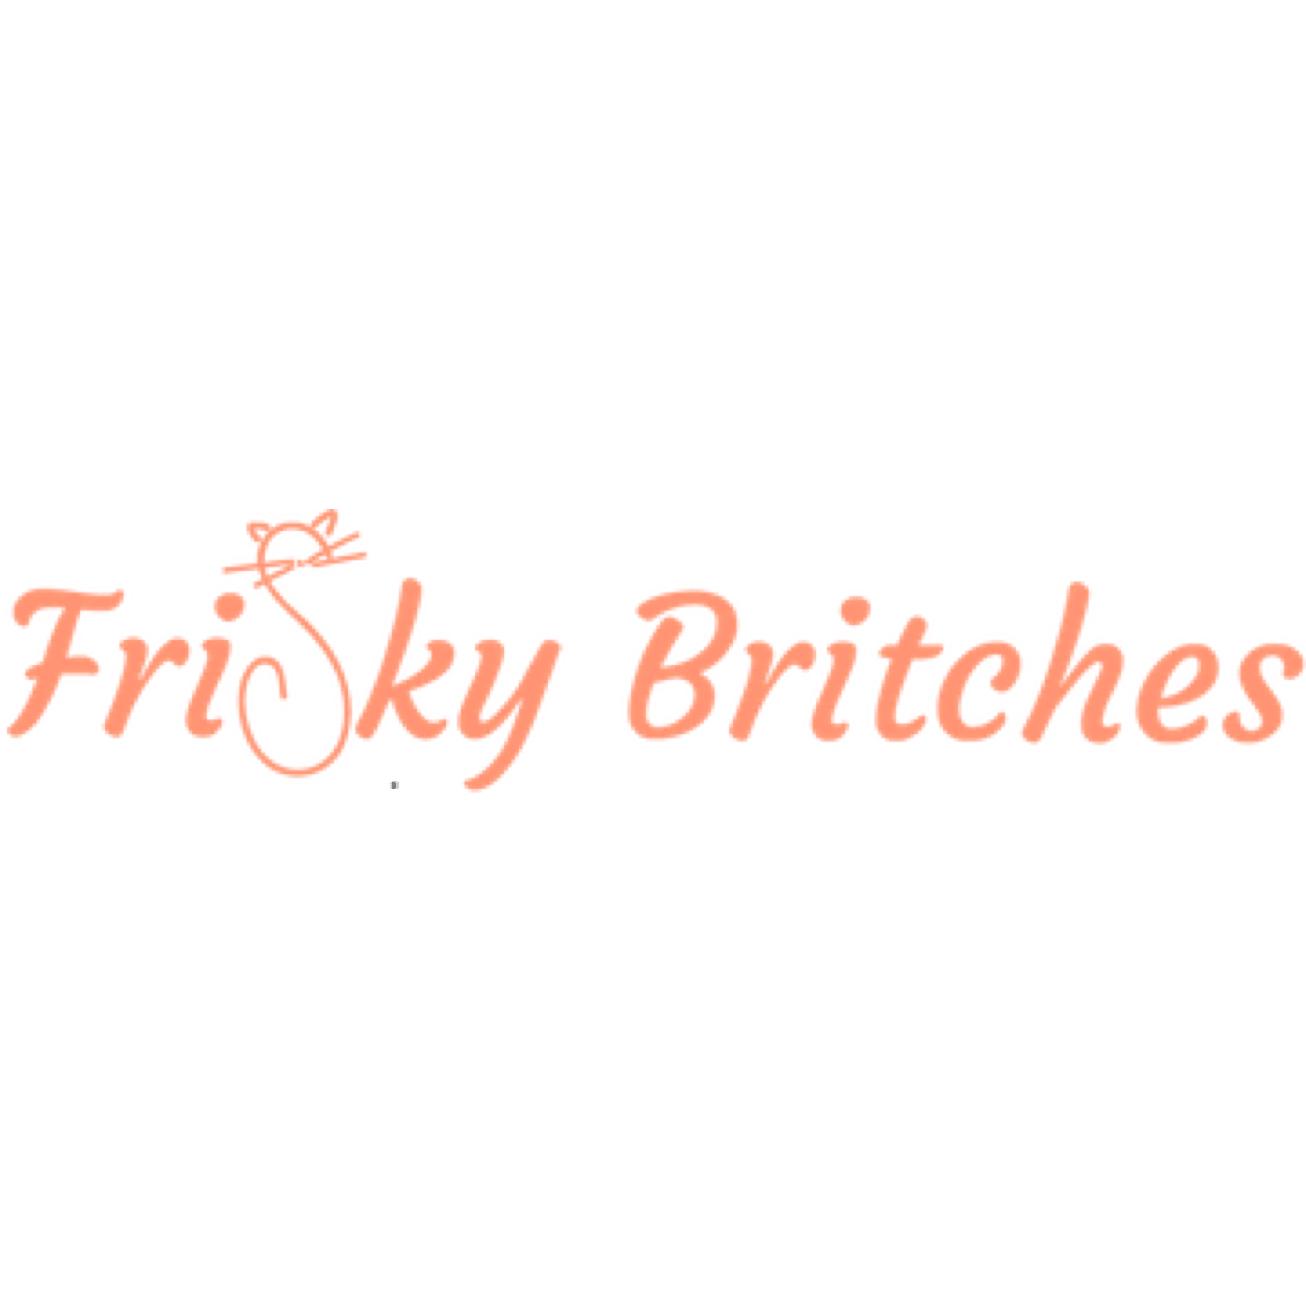 Frisky Britches